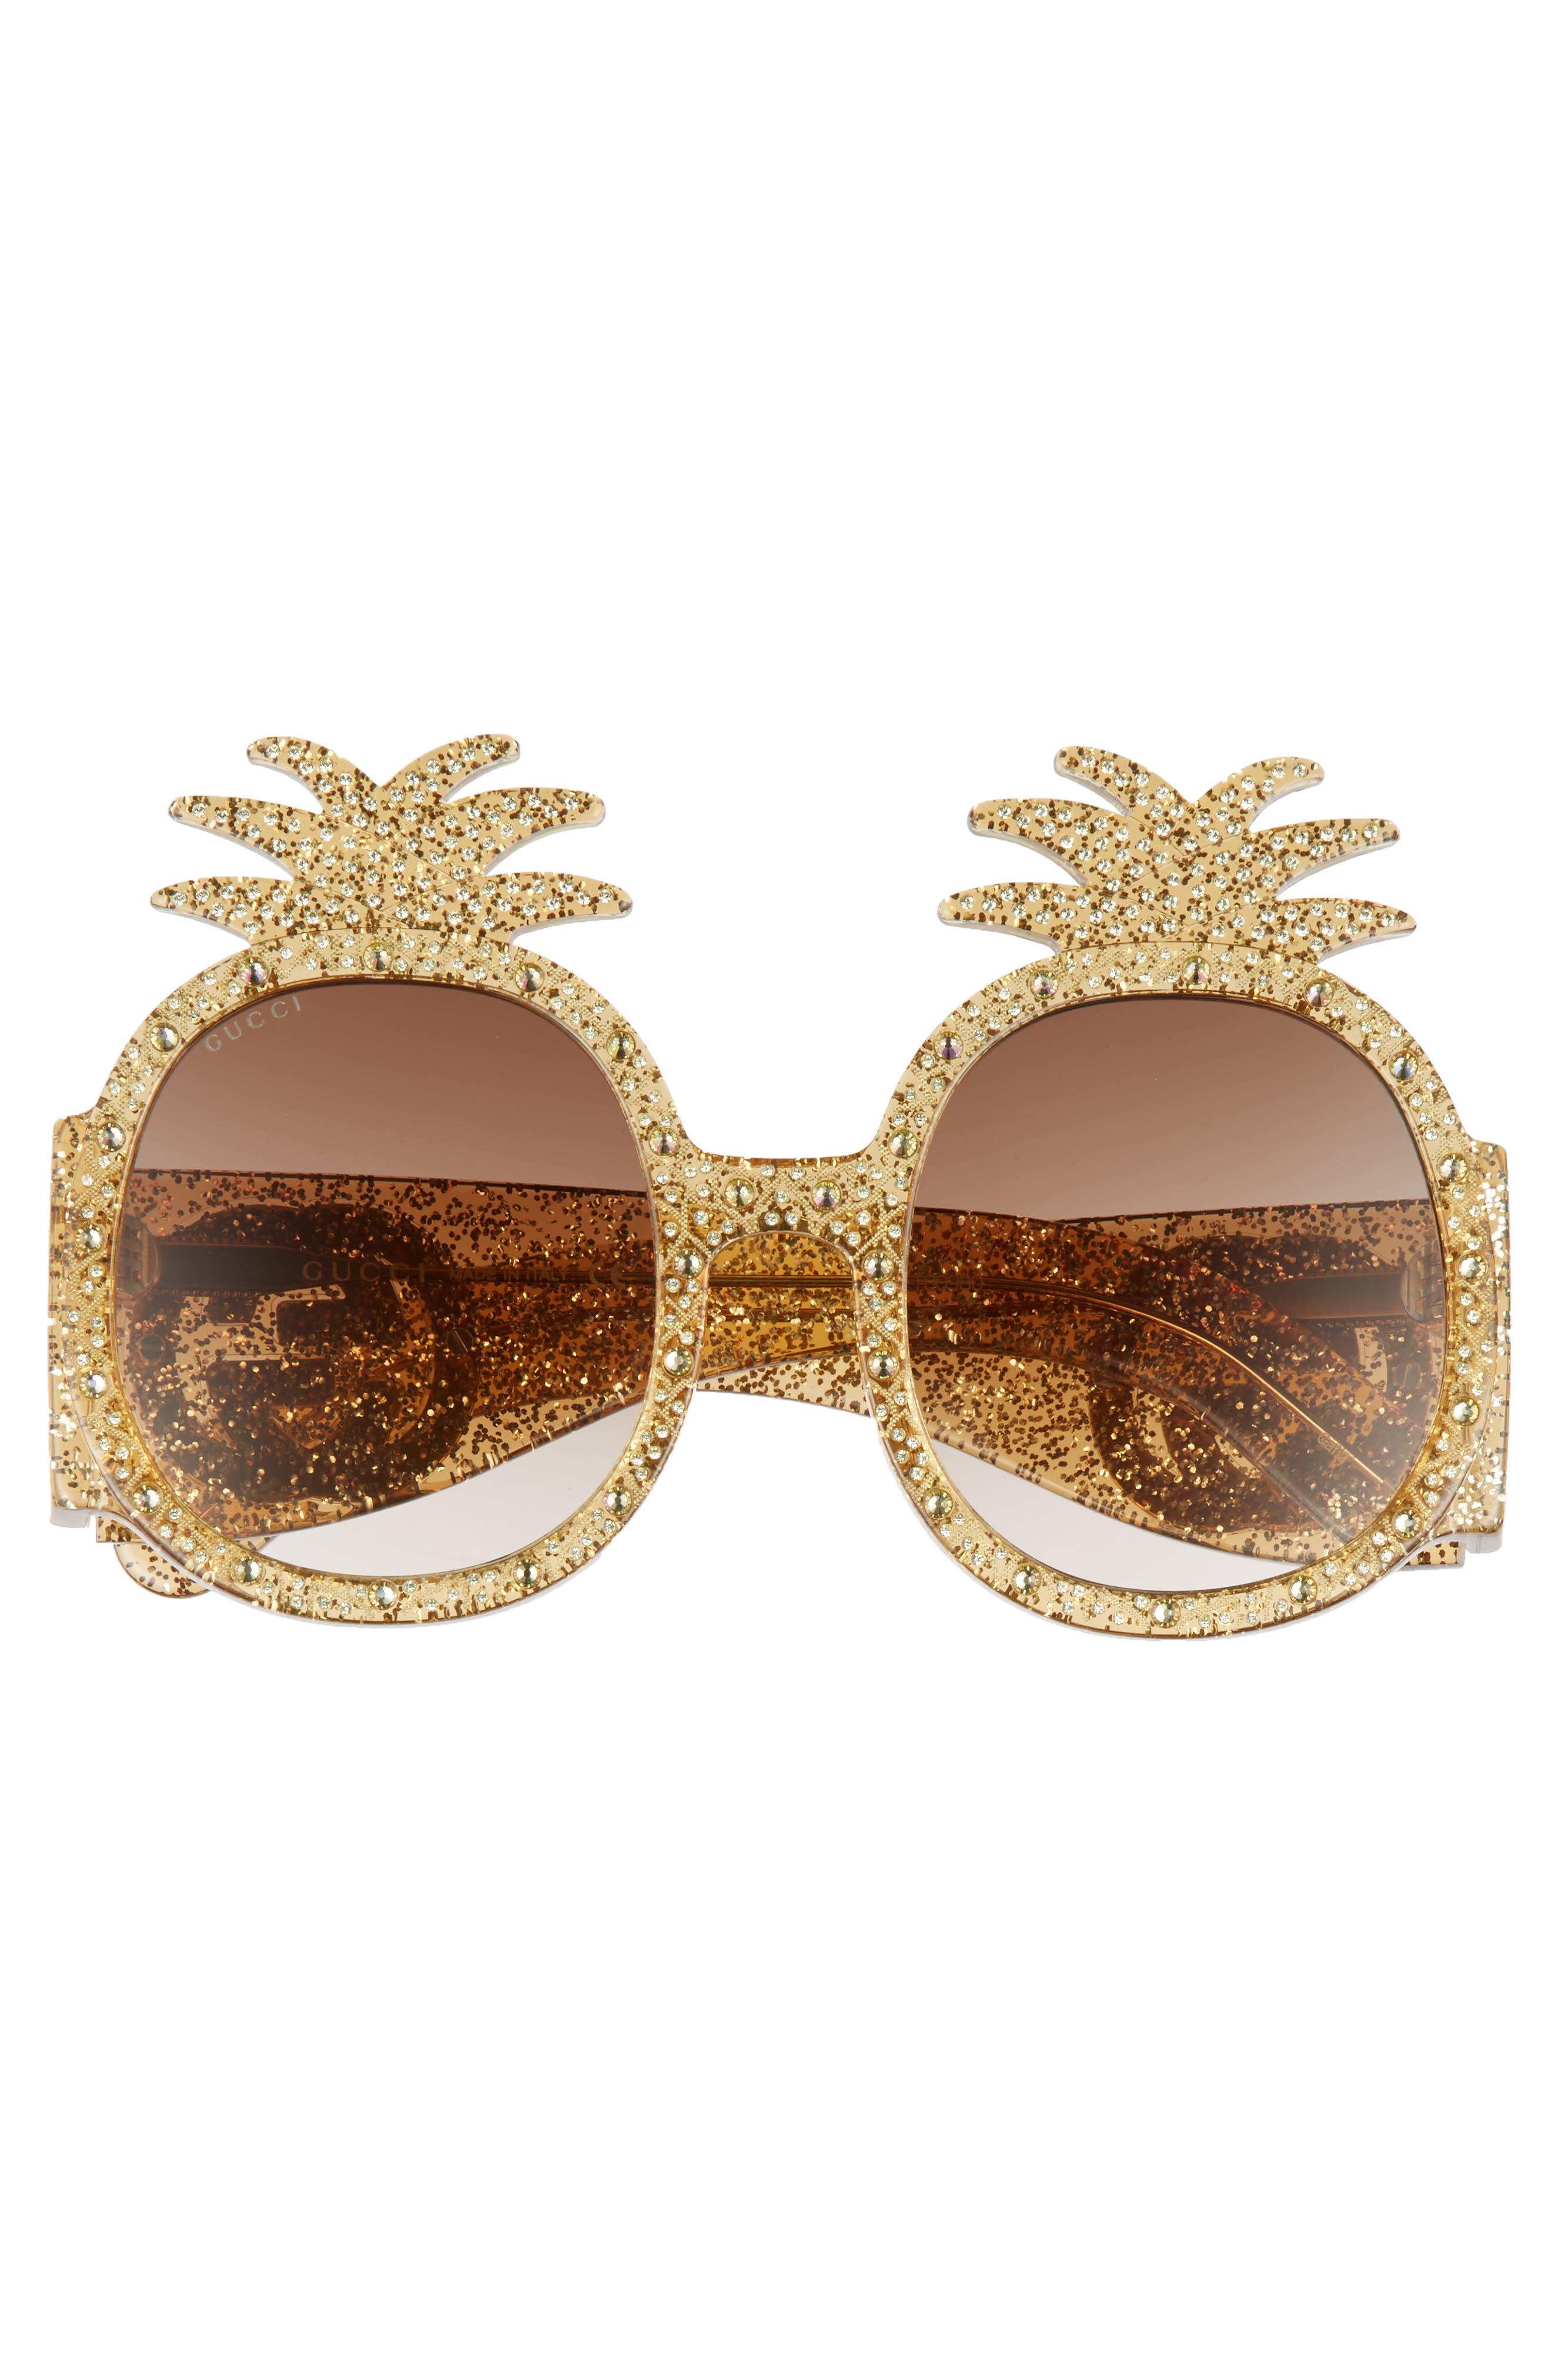 53mm Pineapple Sunglasses,                             Alternate thumbnail 4, color,                             GOLD